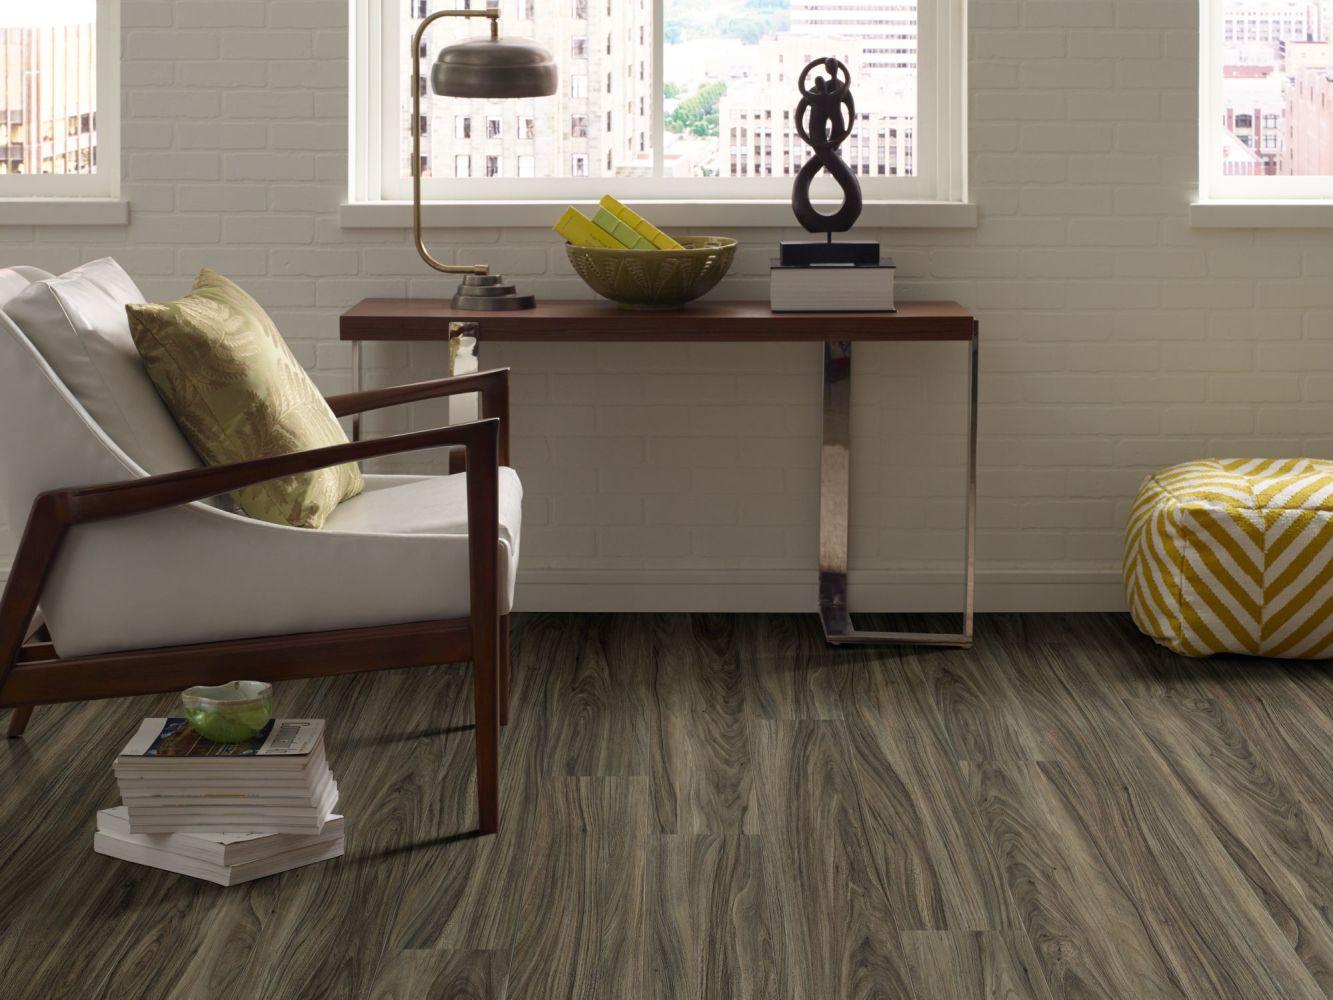 Shaw Floors Reality Homes Stanley Lake Costa 00150_103RH